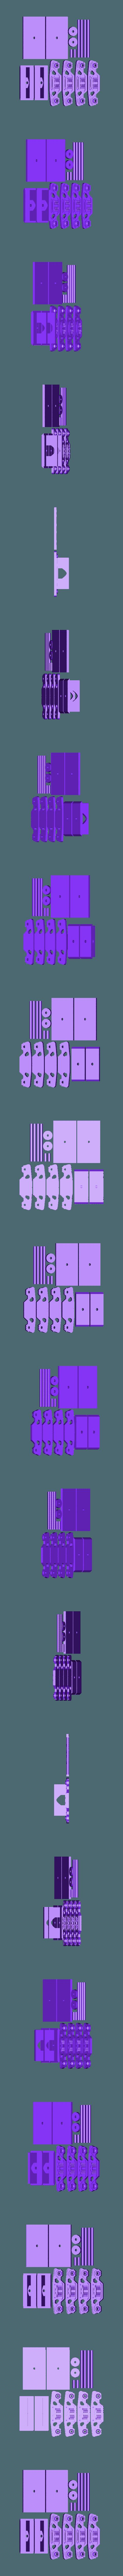 diesel01c_part04.stl Download STL file Diesel-01-C locomotive - ERS and others compatibile, FDM 3D printable • 3D printer object, euroreprap_eu